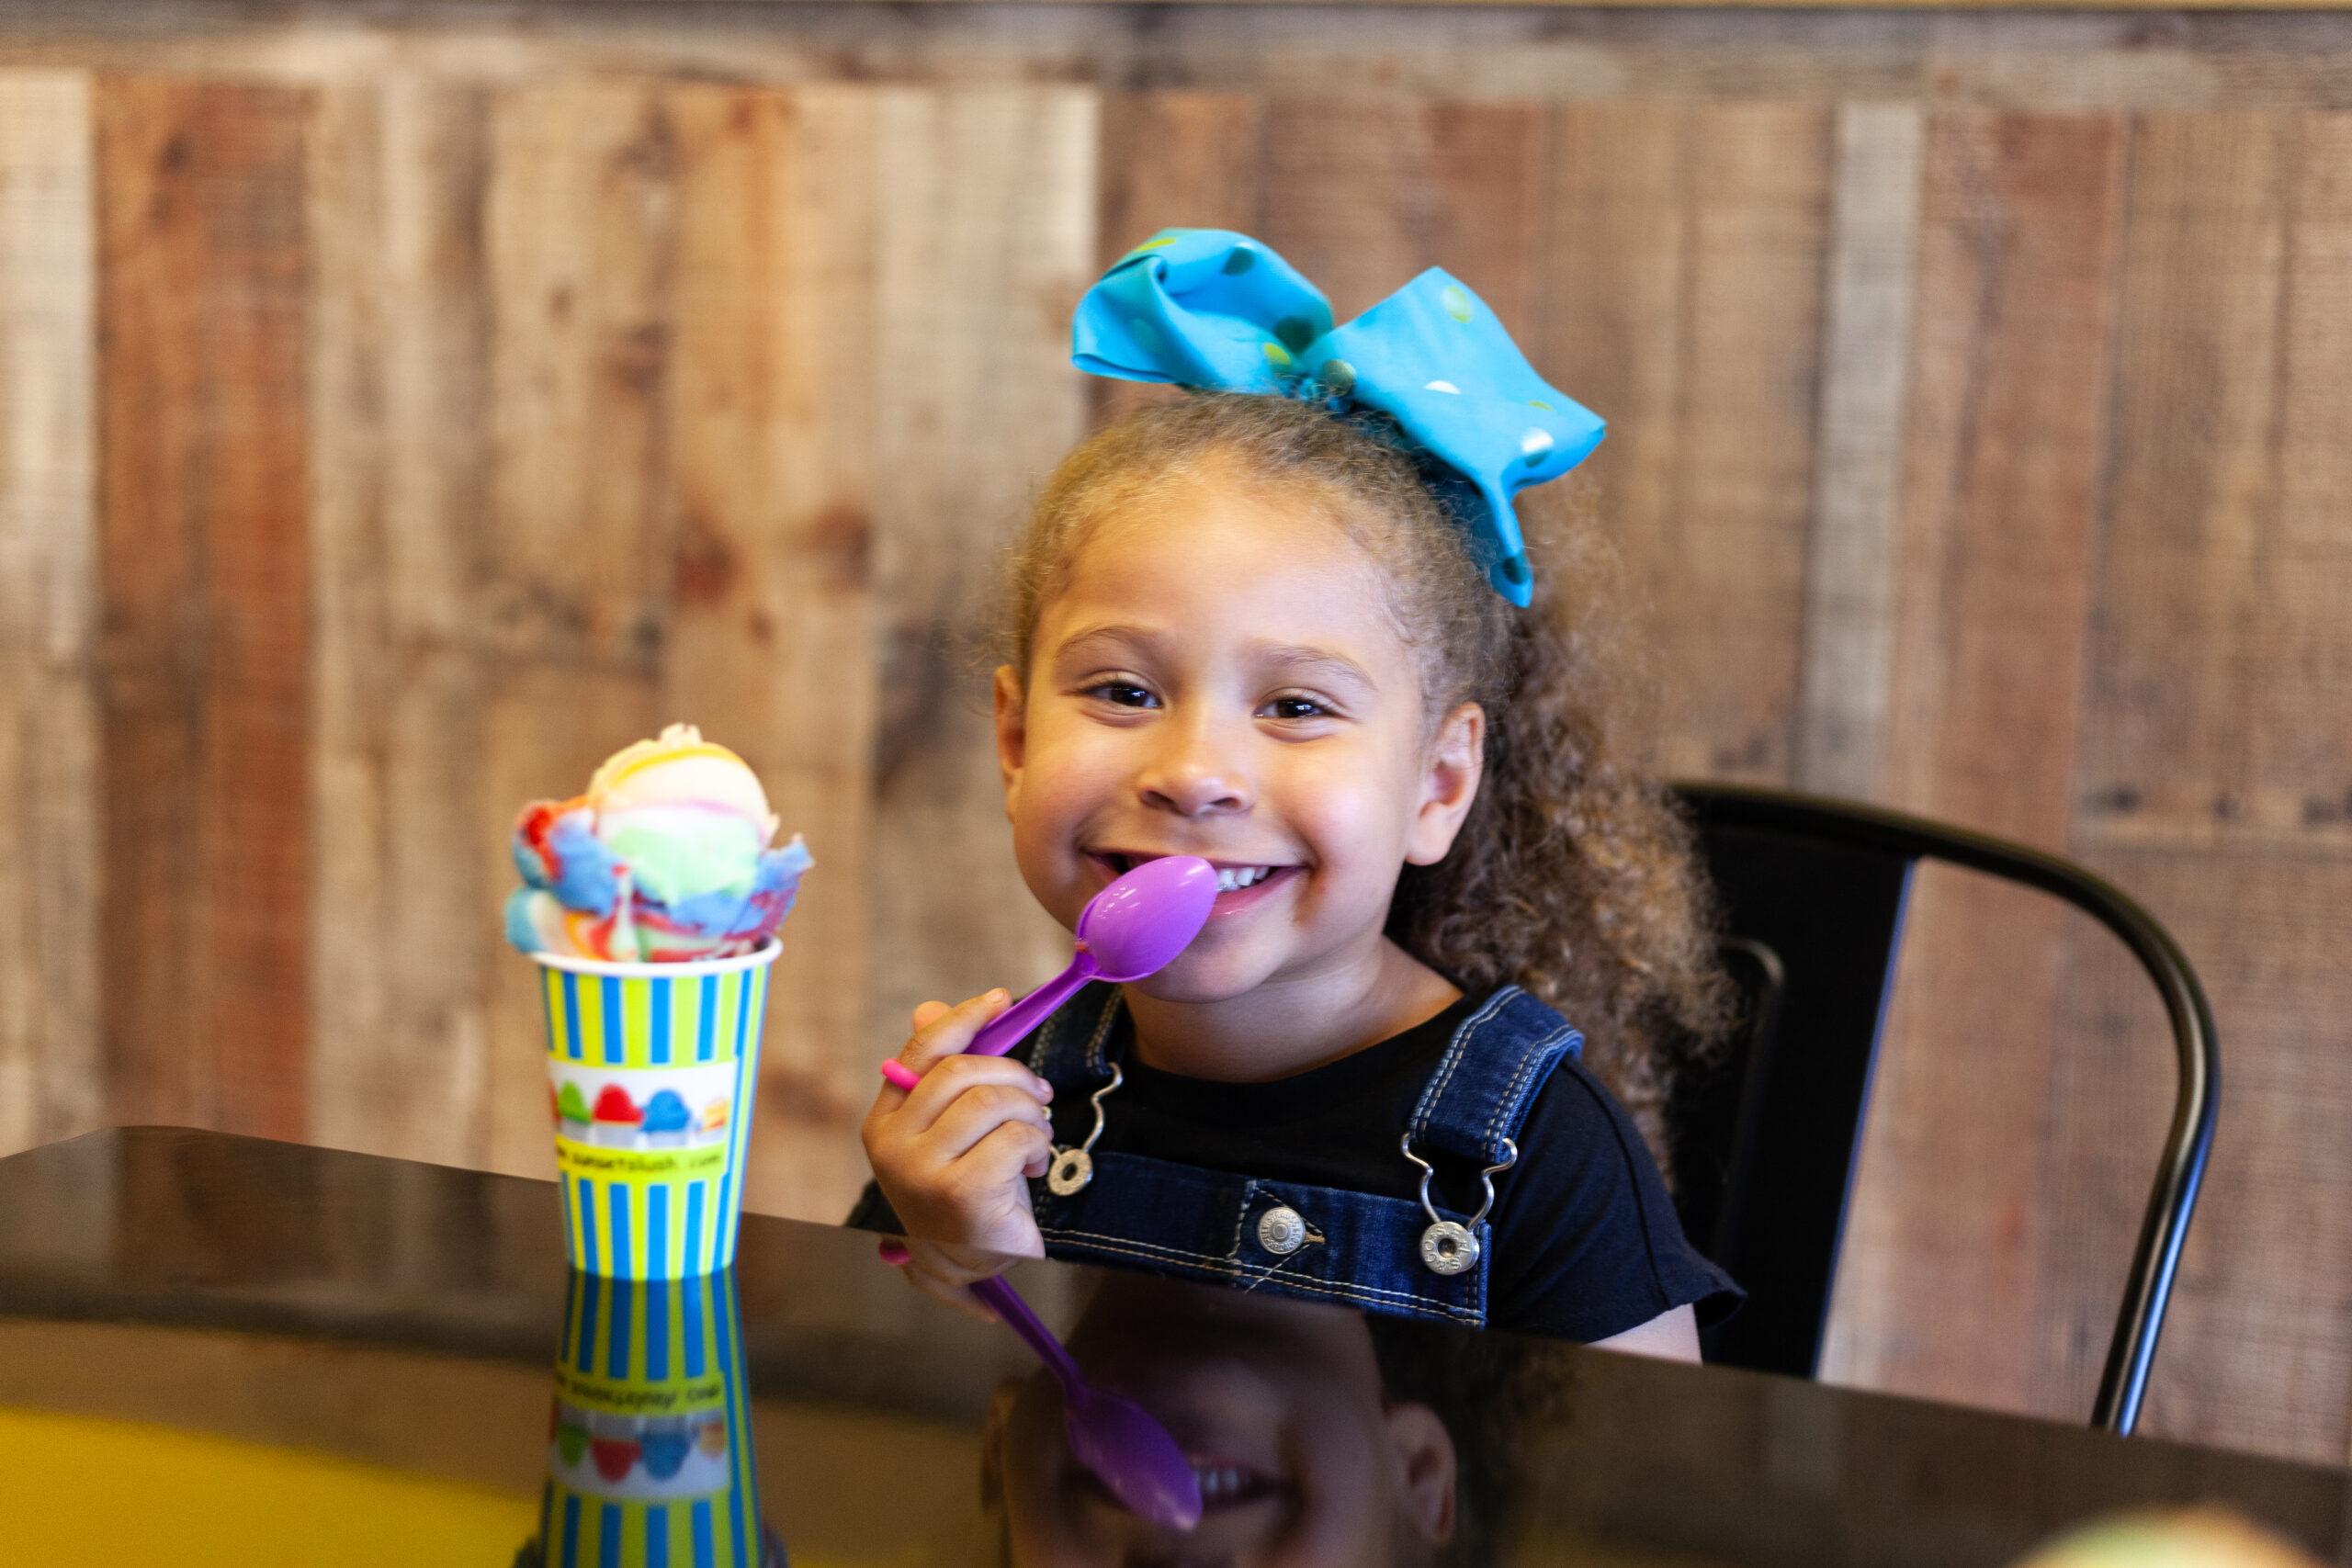 Italian ice slushy ice cream smiles